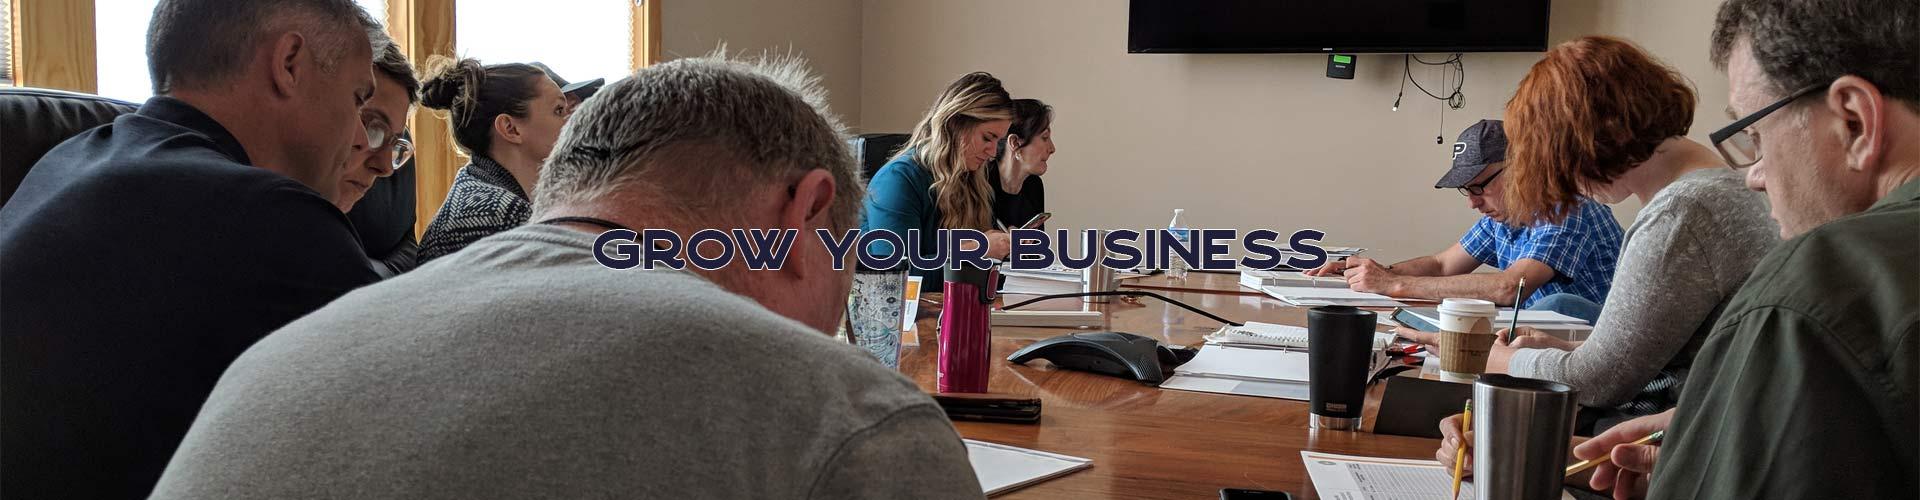 grow-your-business-header